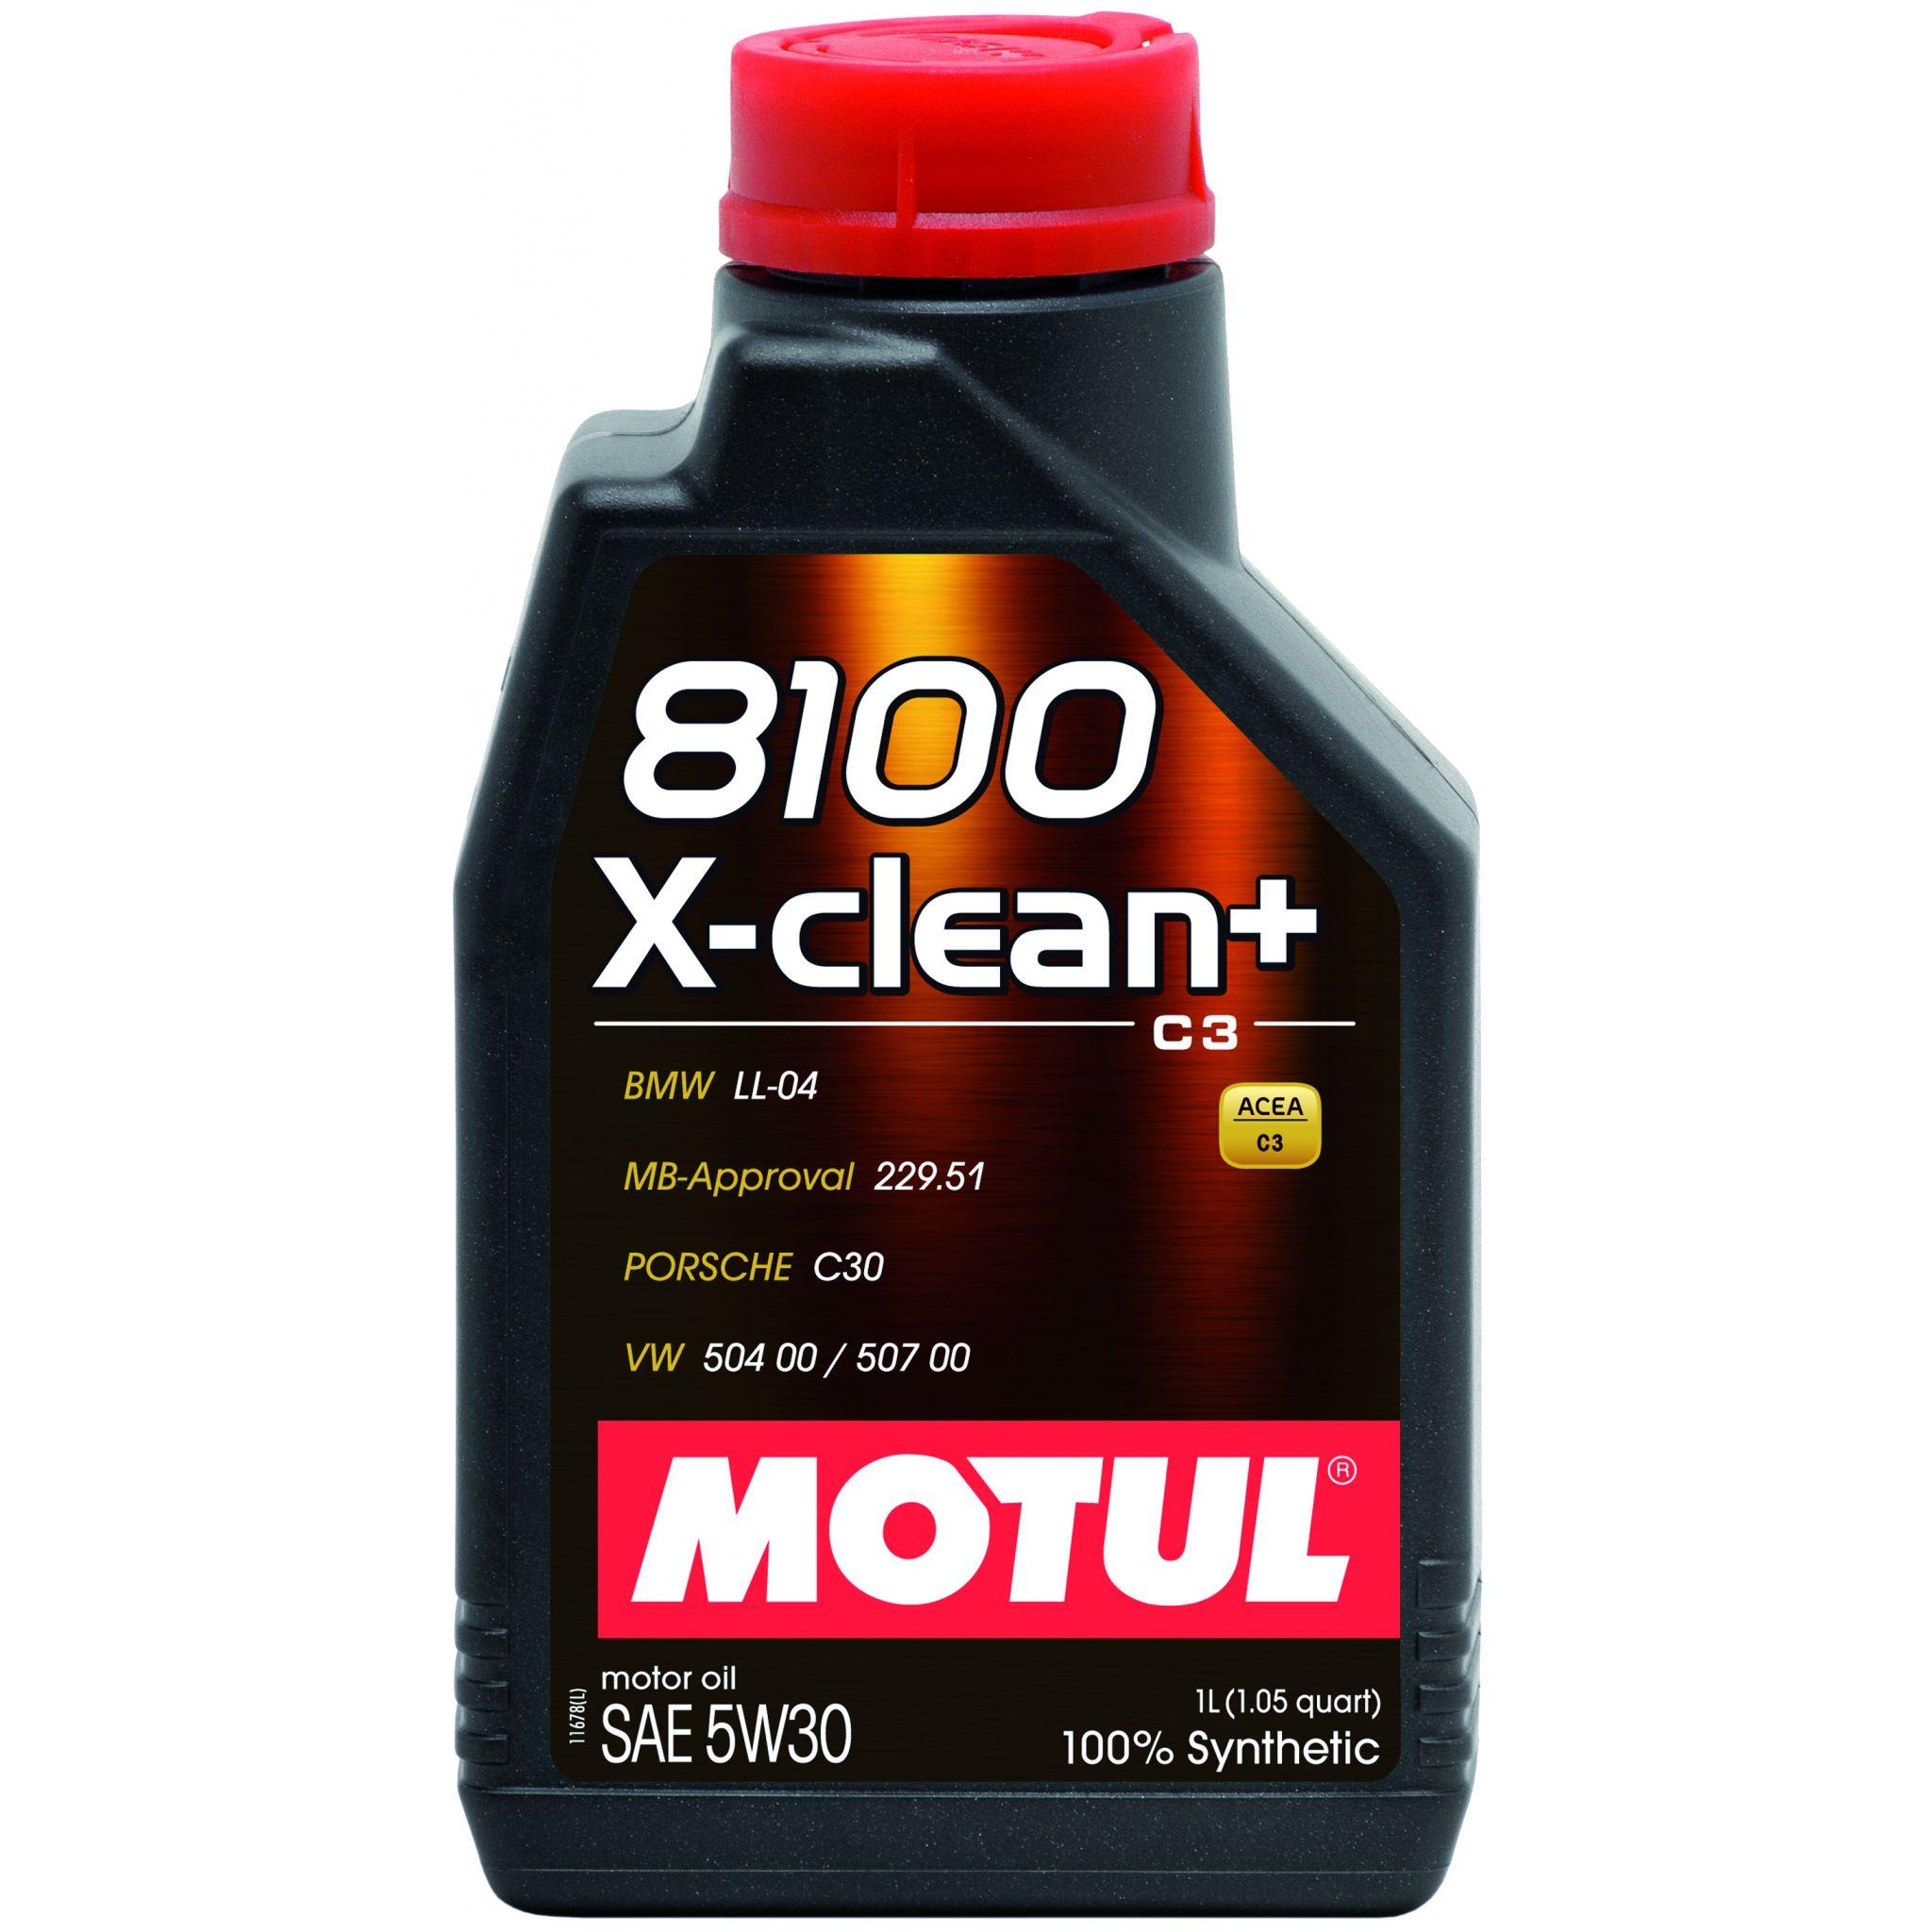 Motul 8100 X-CLEAN + 5W30 - 1L - Synthetic Engine Oil